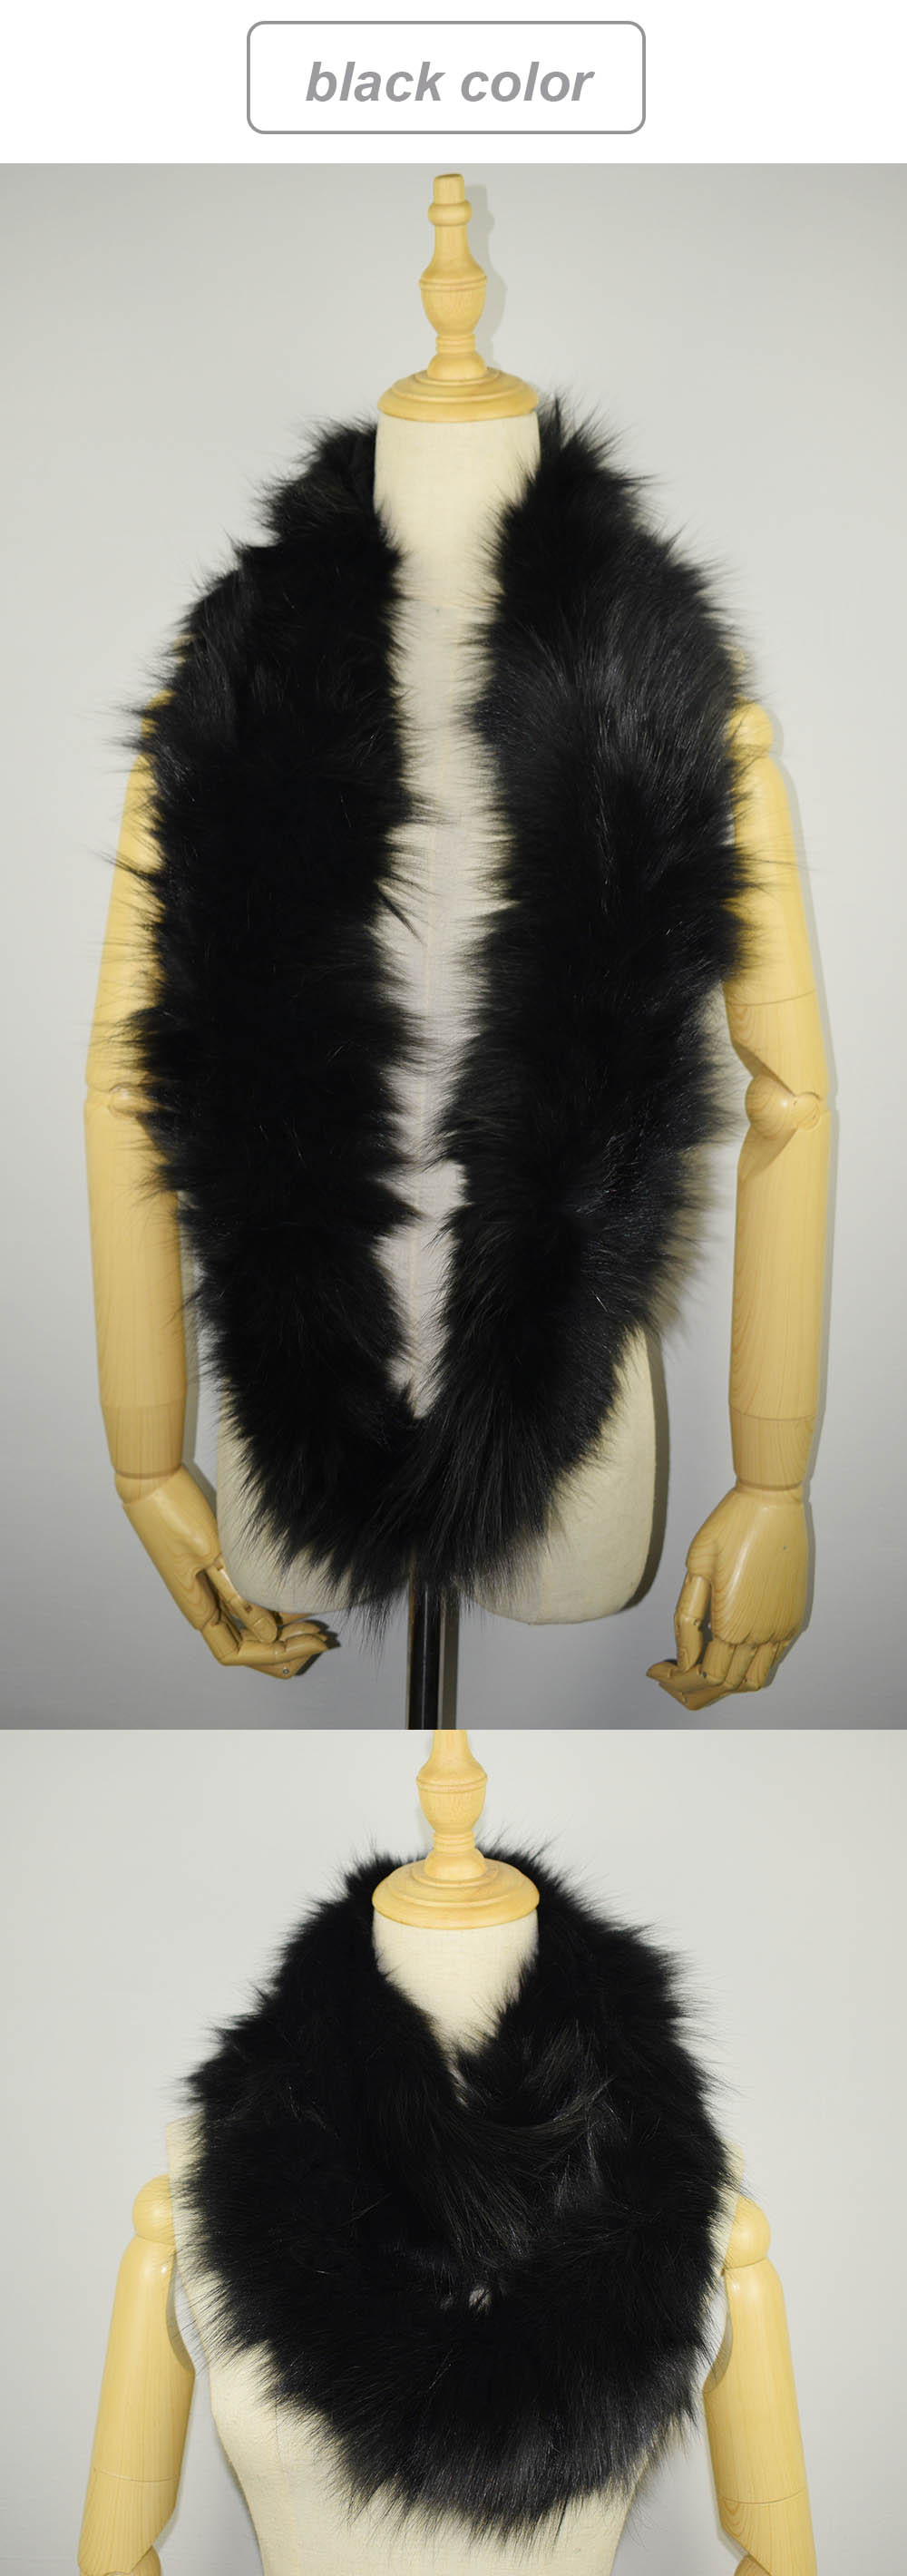 knit fox fur scarf black color